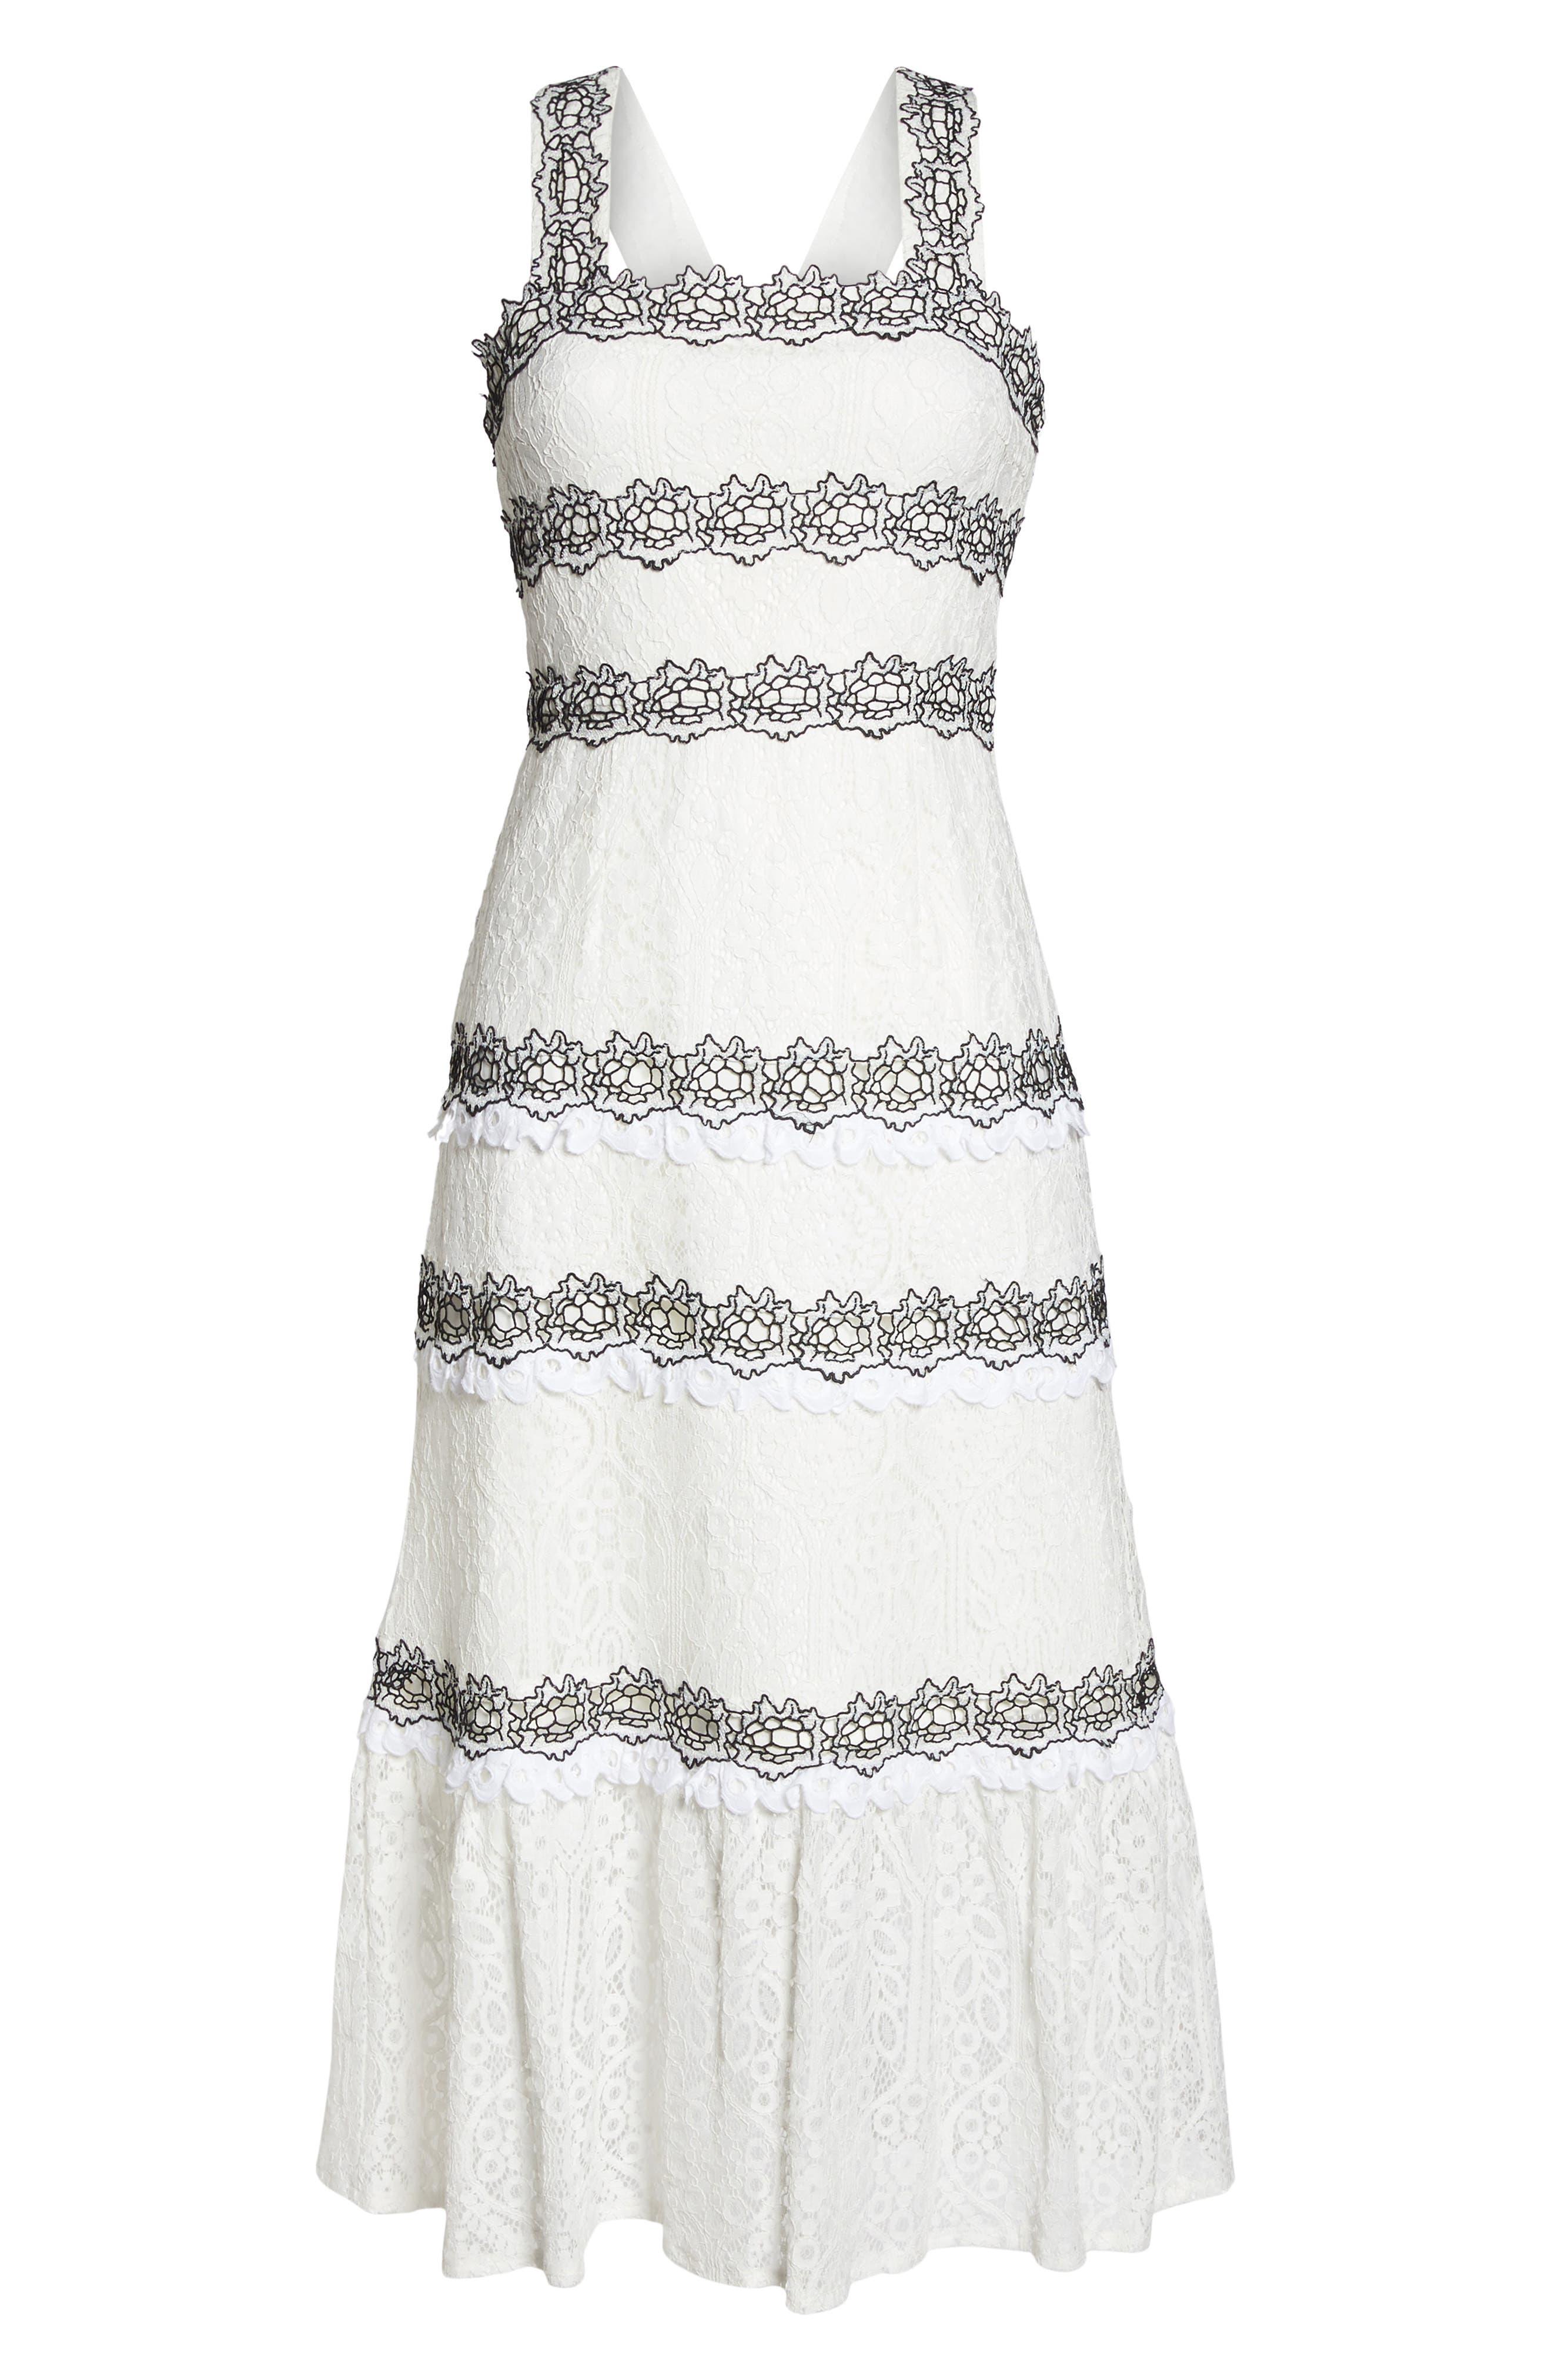 Frances Embroidered Lace Midi Dress,                             Alternate thumbnail 7, color,                             102